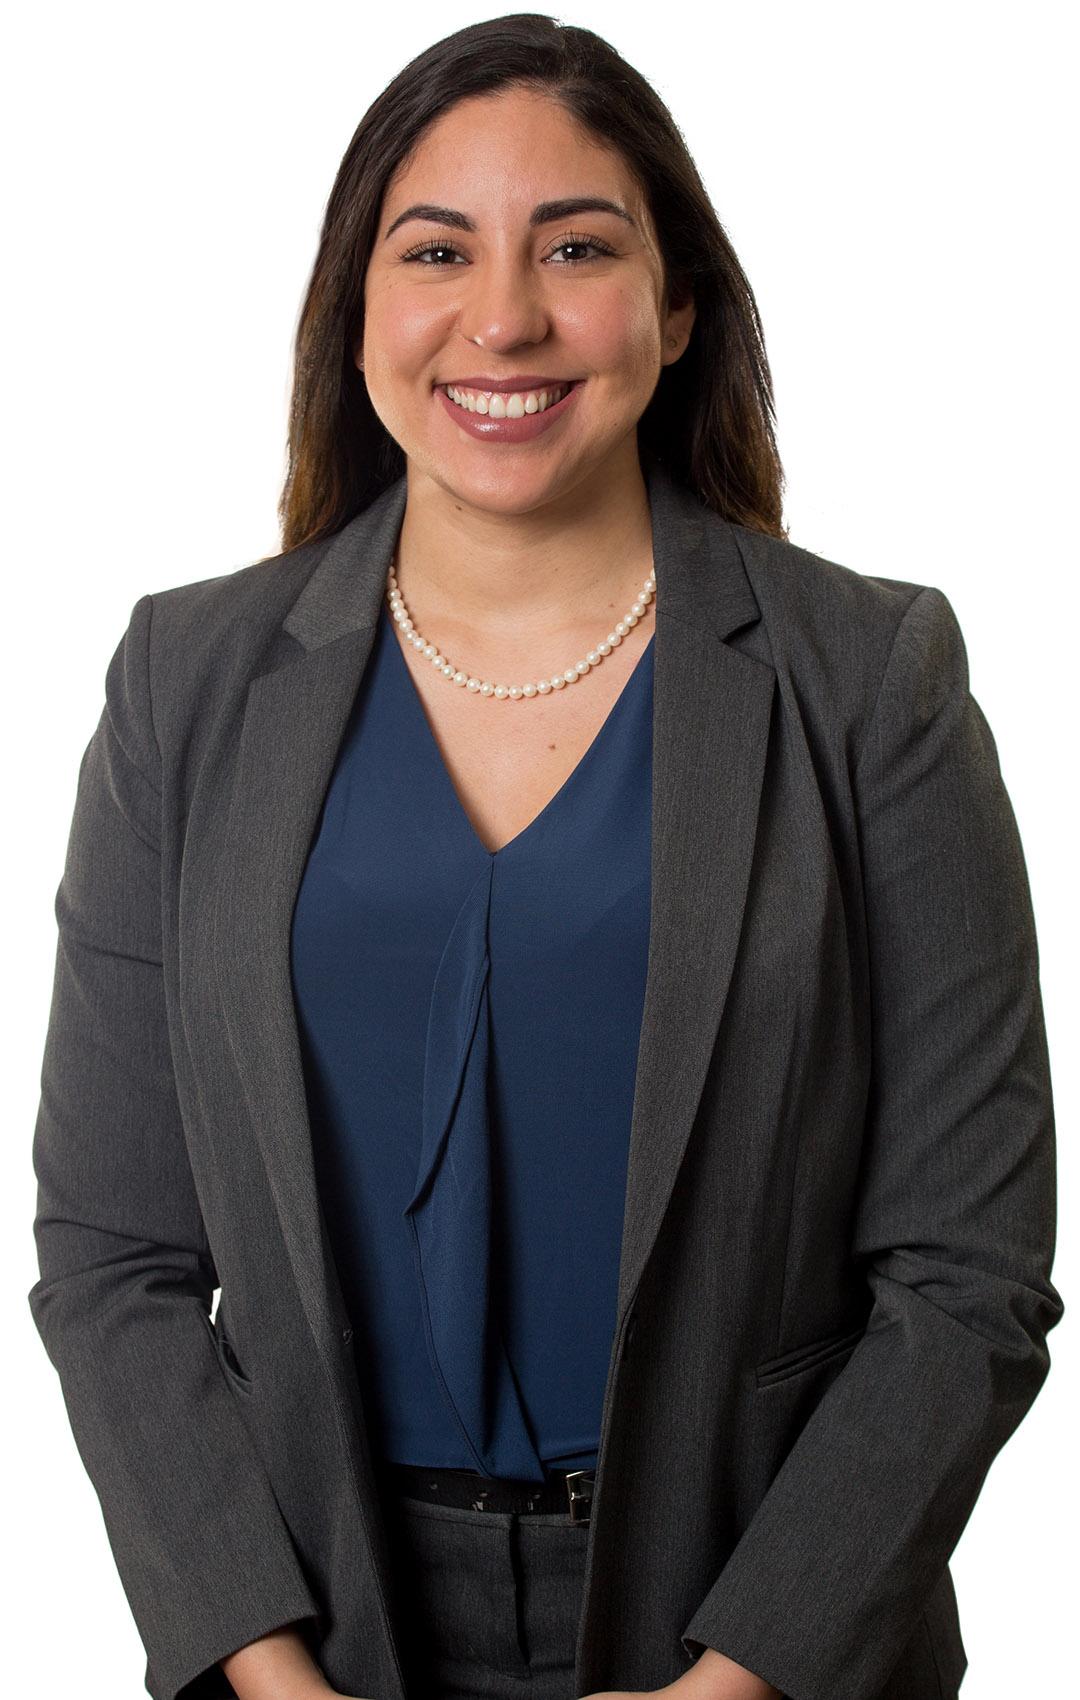 Maria A. Penuela